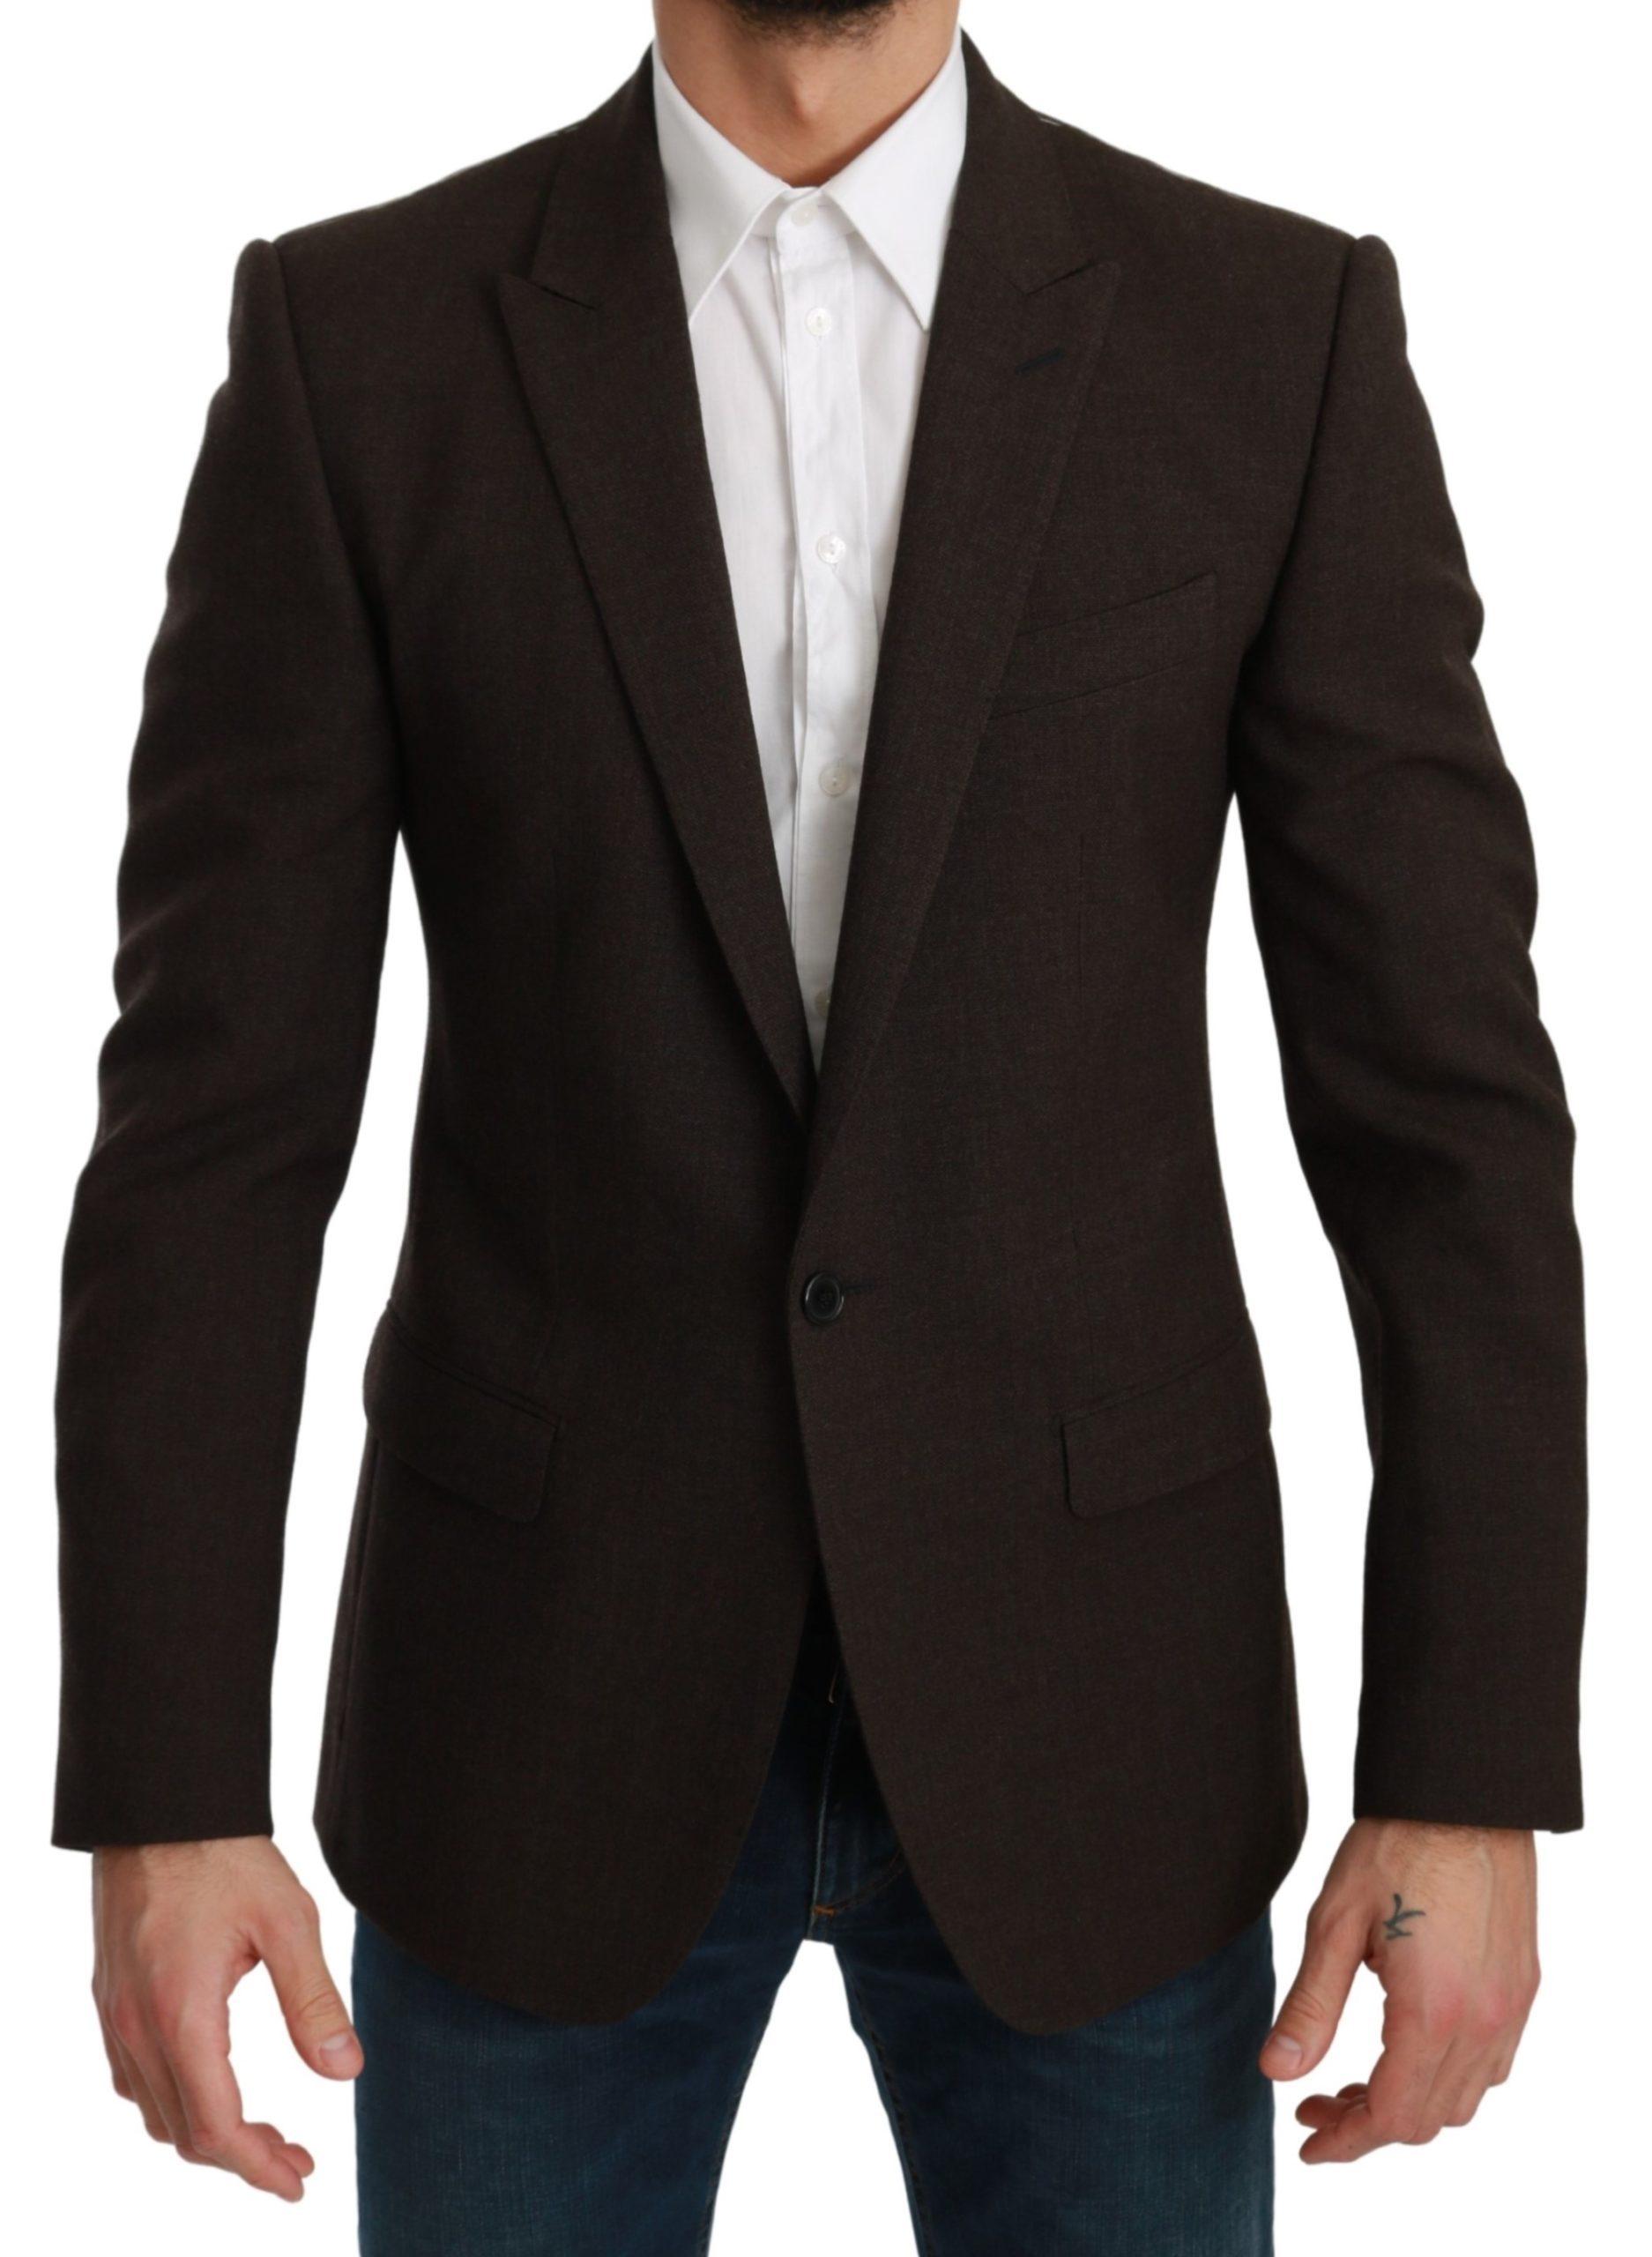 Dolce & Gabbana Men's Slim Fit Coat Jacket MARTINI Blazer Brown KOS1774 - IT48 | M